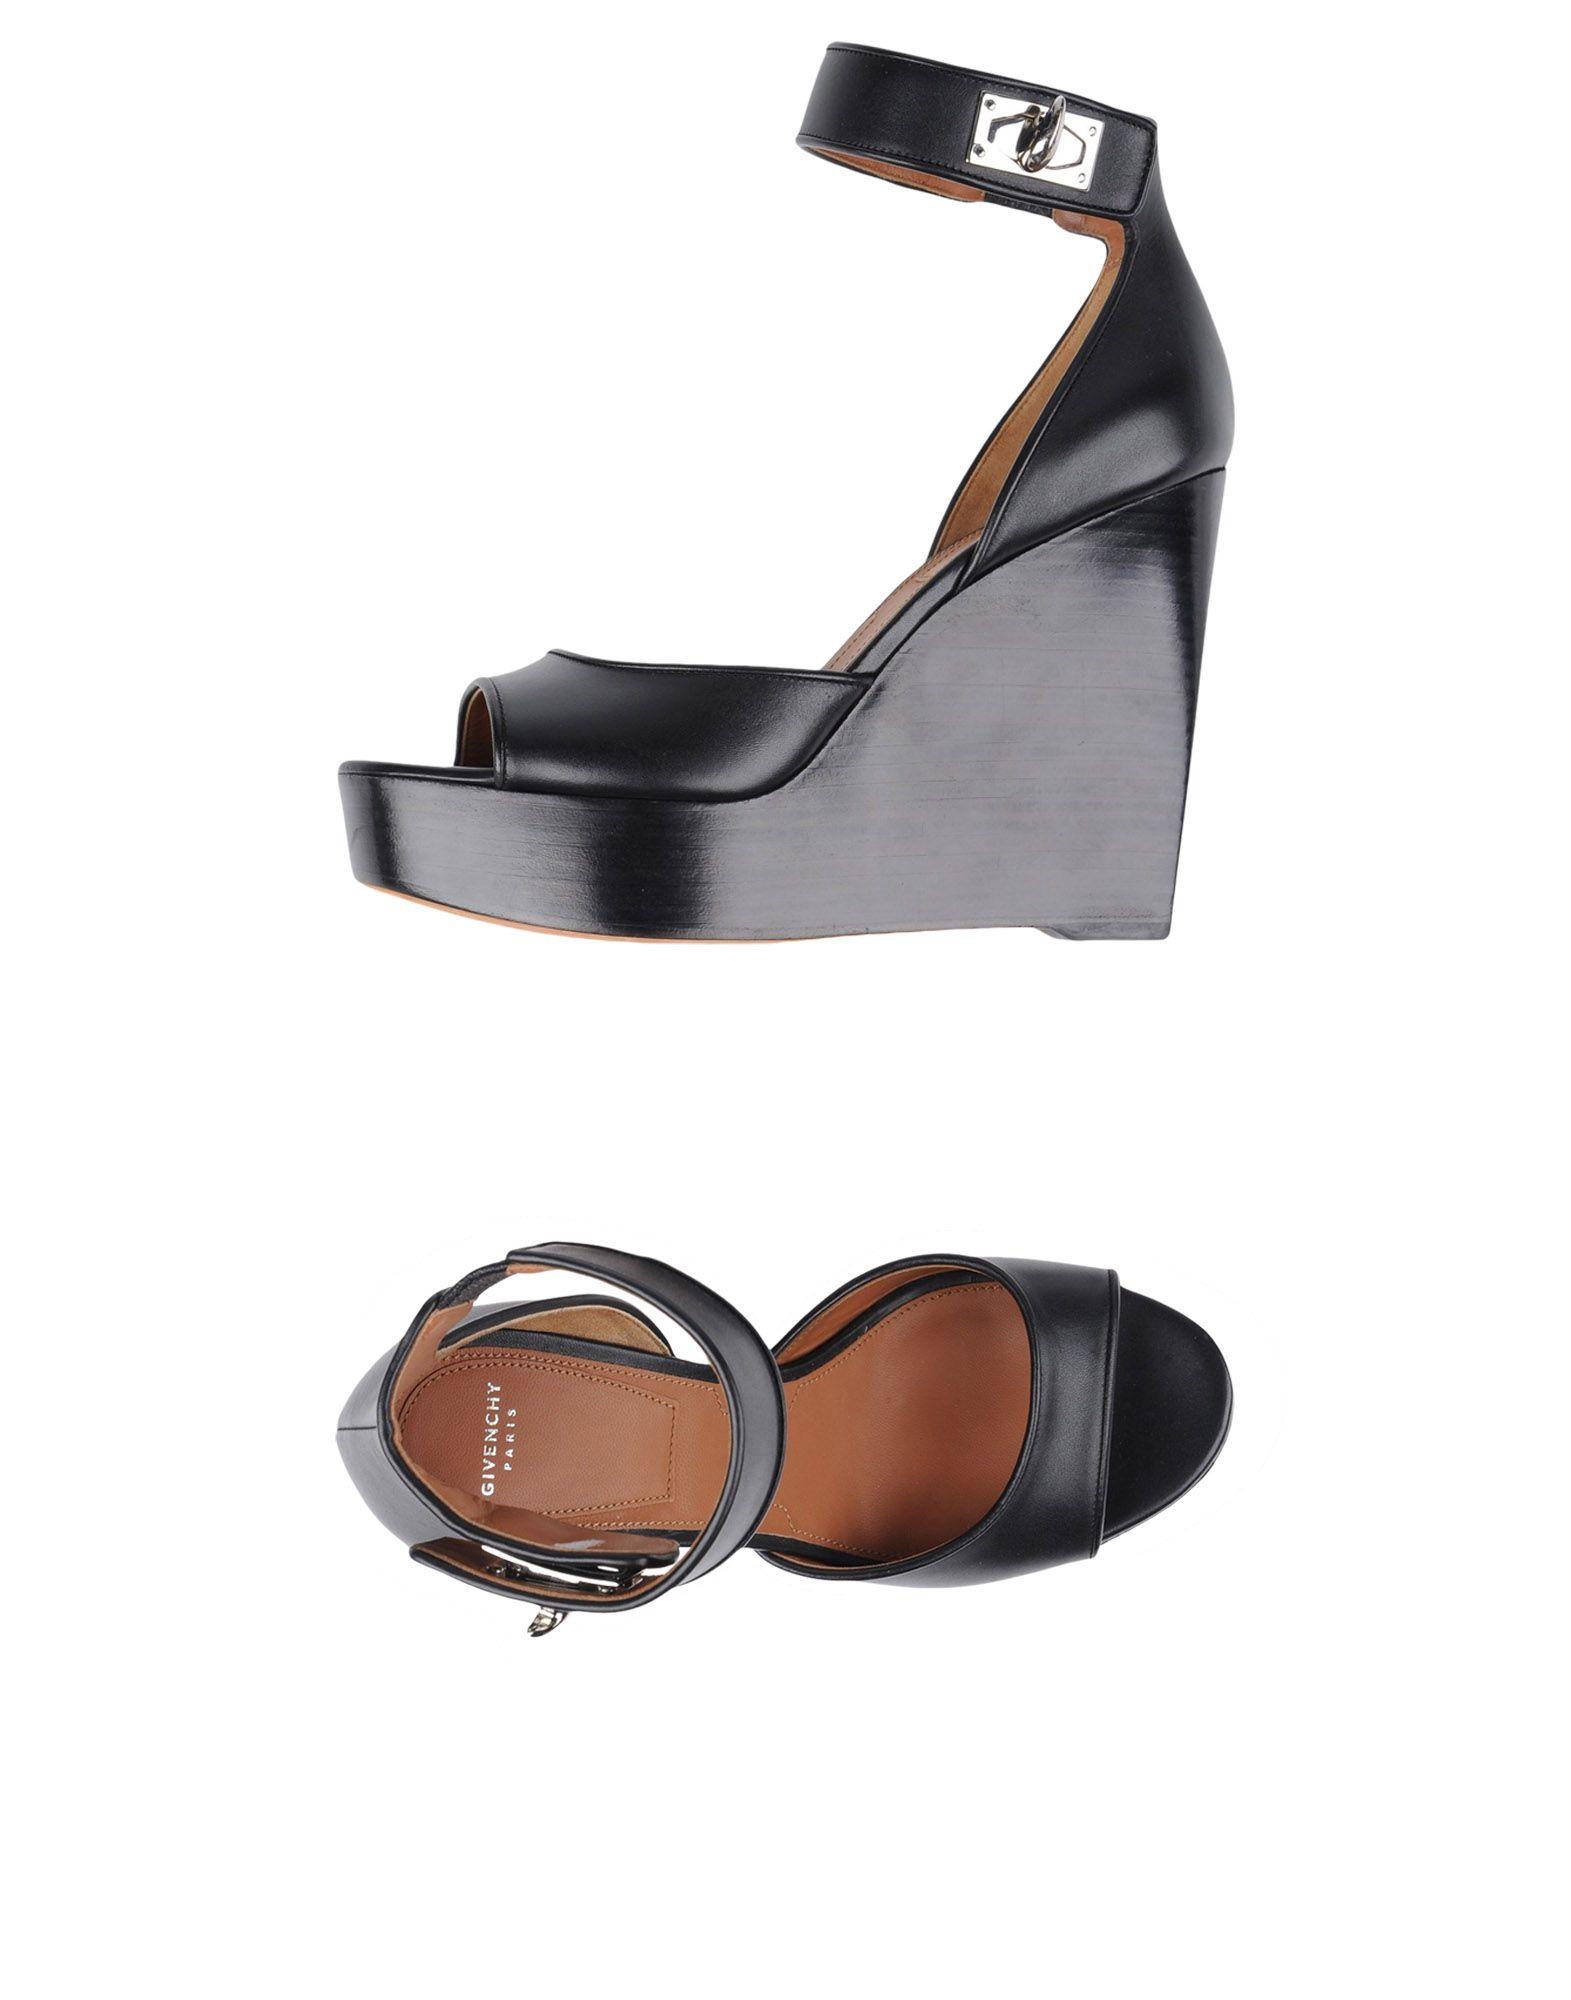 A buon mercato Sandali Givenchy Donna - 11334704KI